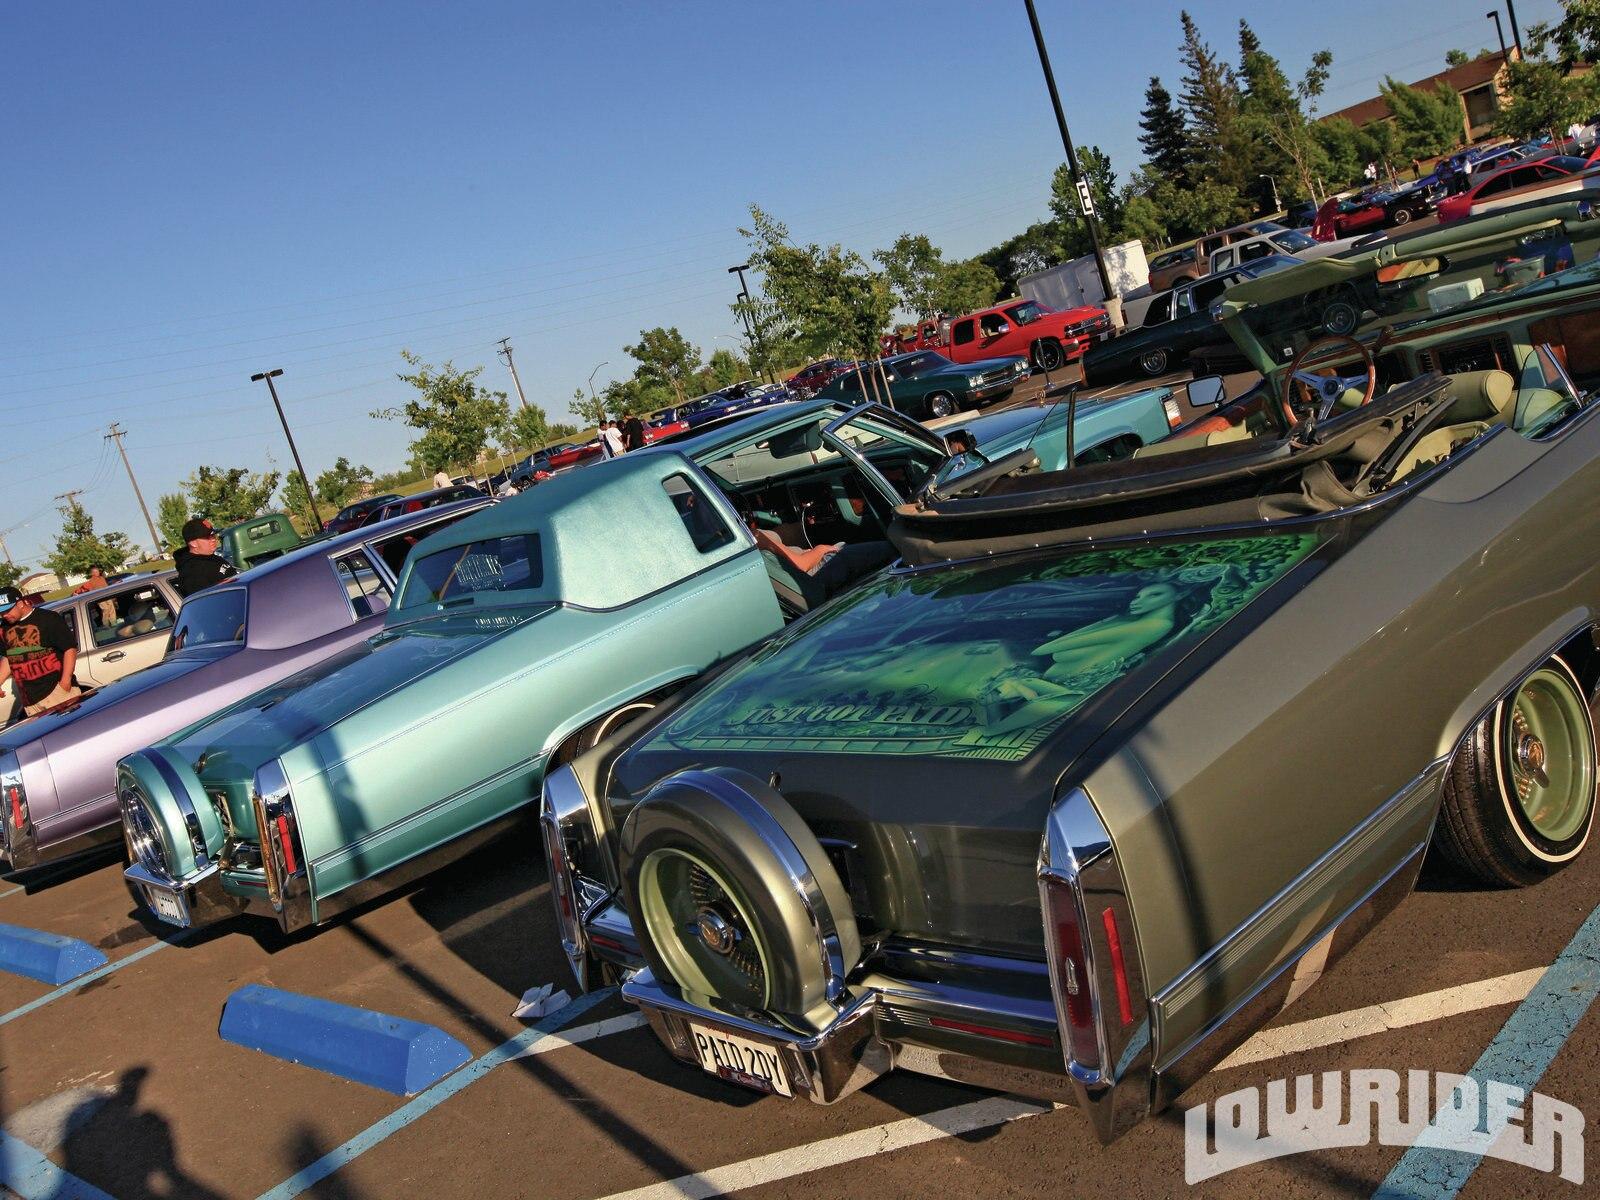 1201-lrmp-20-o-socios-9th-annual-car-show-custom-cadillac1